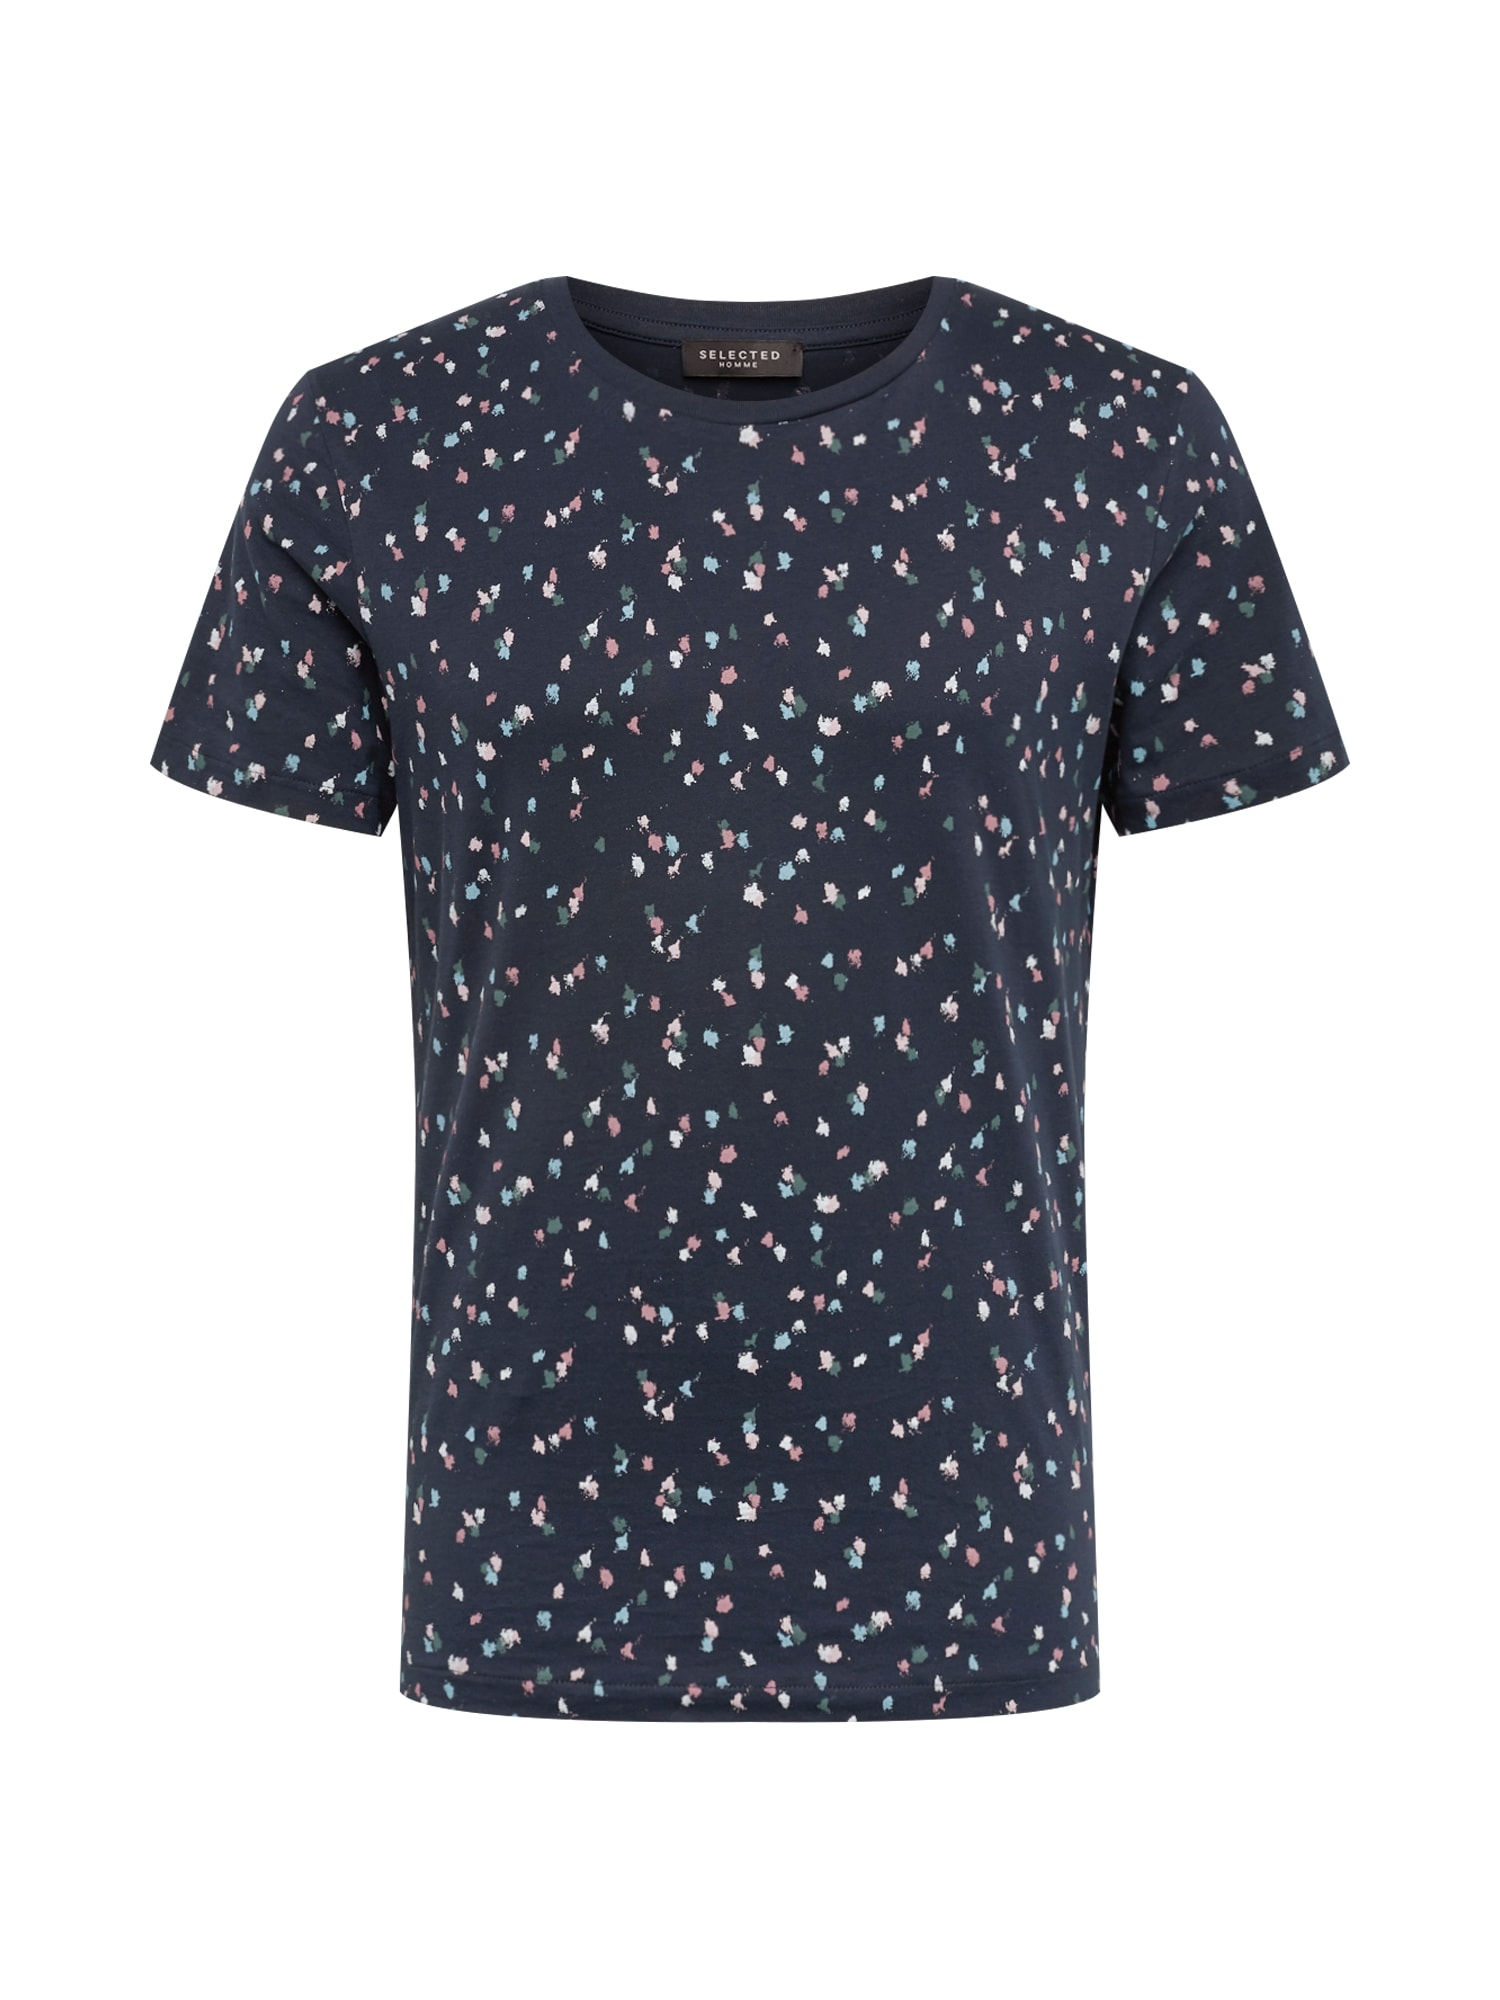 Tričko Sum tmavě modrá mix barev bílá SELECTED HOMME